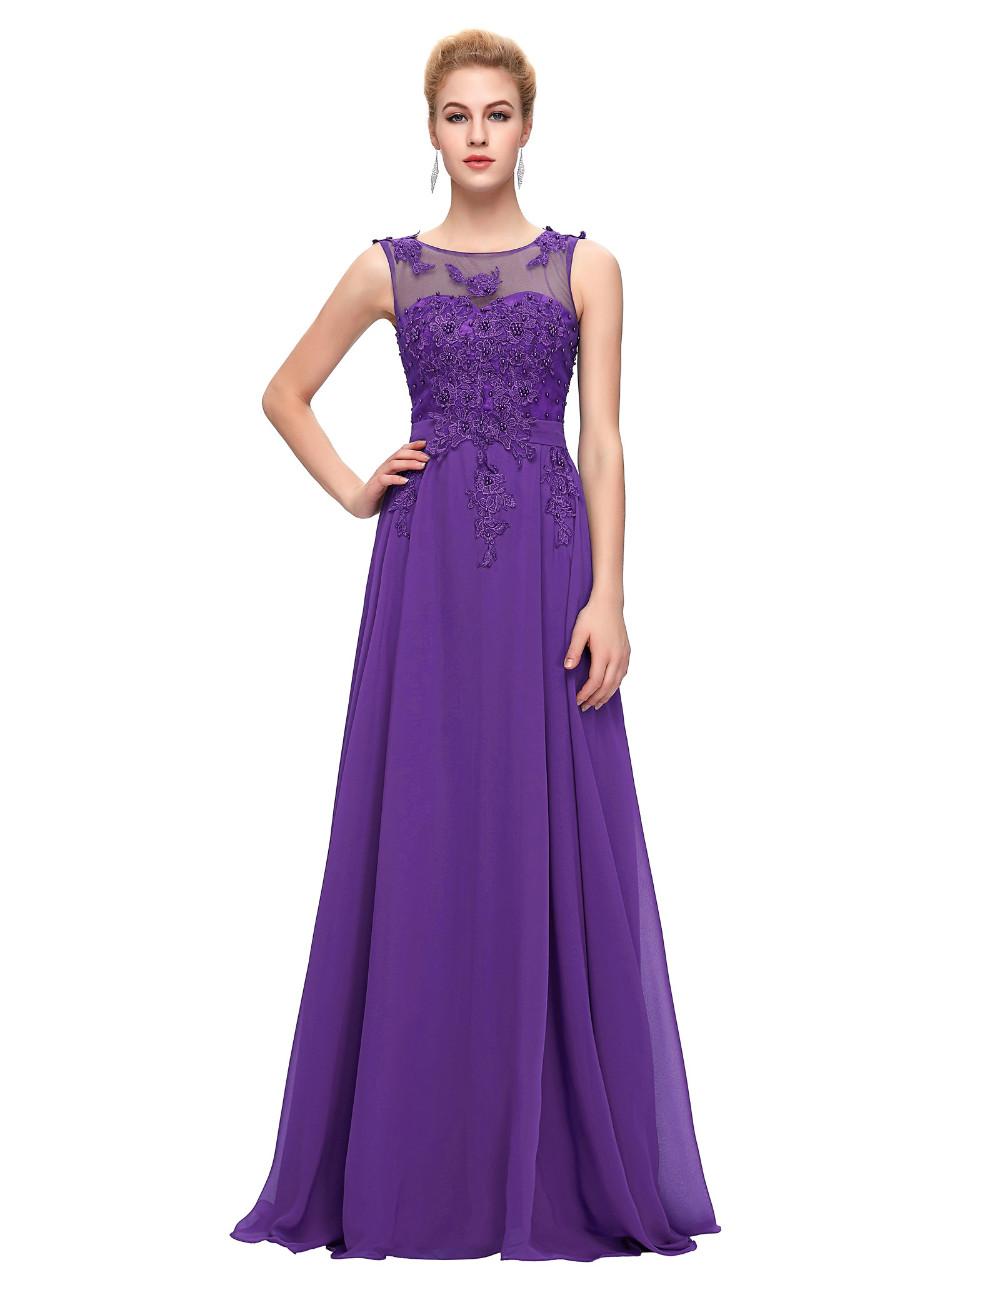 Grace Karin Elegant Long Evening Dresses 2016 Chiffon Pink Purple Red Royal Blue Black Formal Evening Dress Gown Abendkleider 31